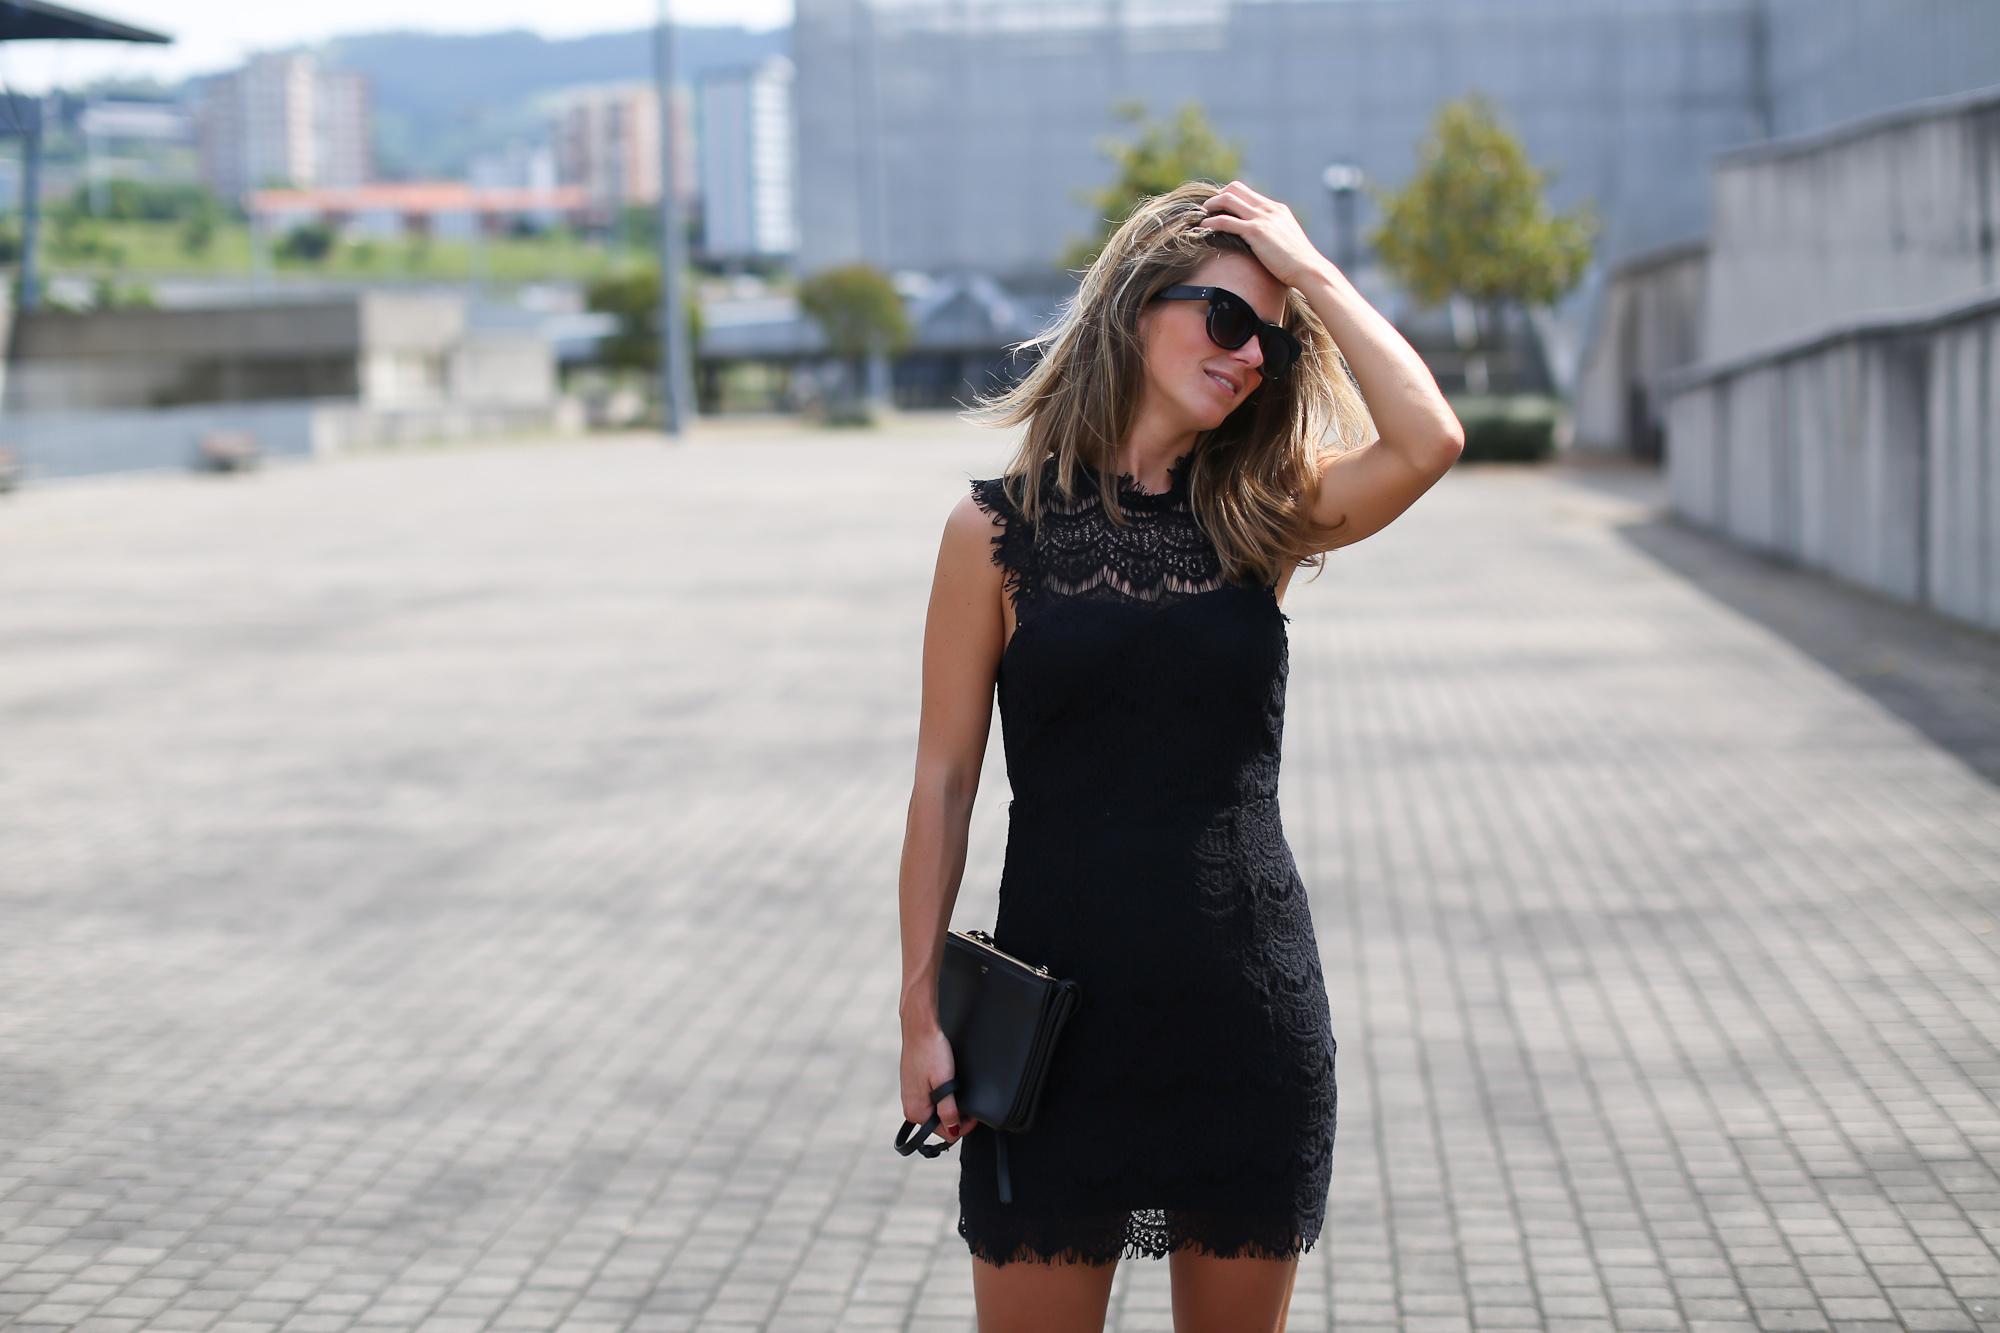 Clochet_streetstyle_tiesandheels_vestidovintagesweet_bailarinaspunteraconbrillos-7